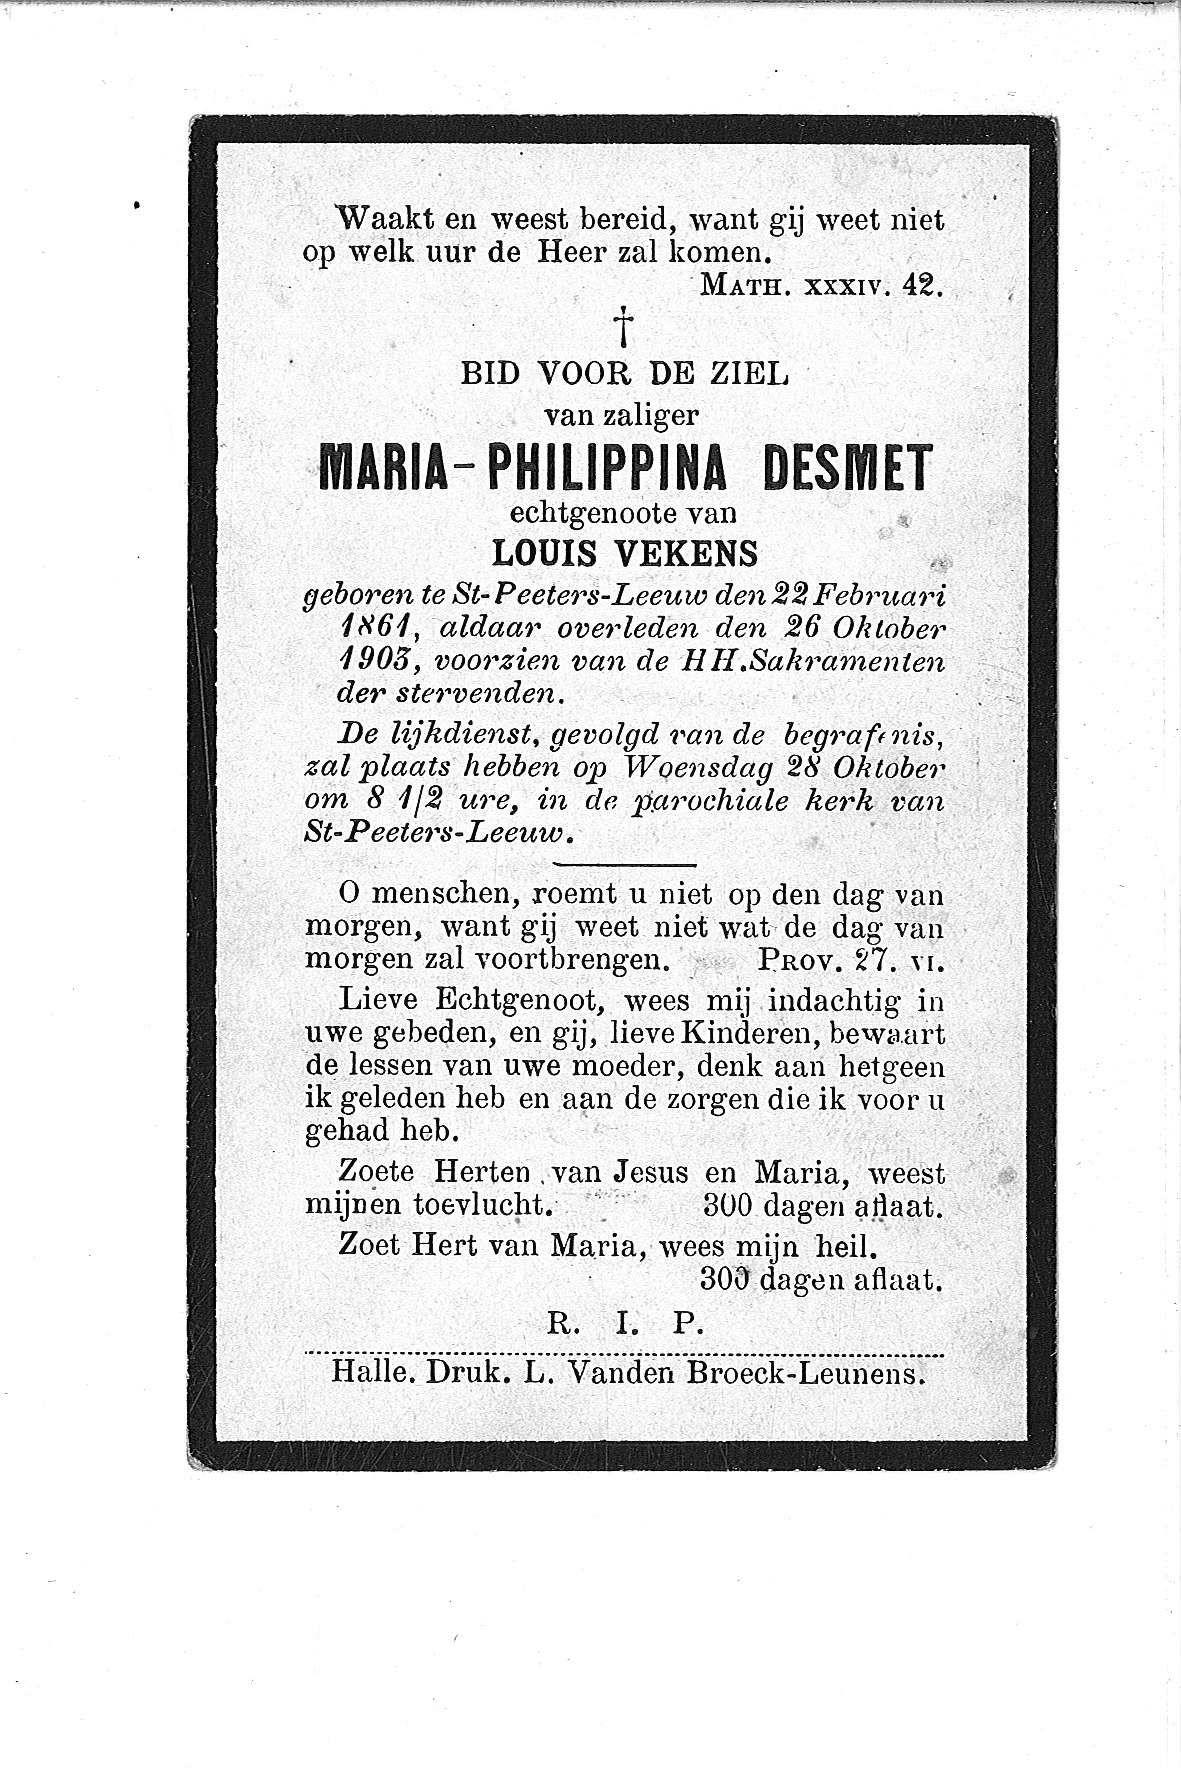 Maria-Philomena (1903) 20120424103450_00258.jpg